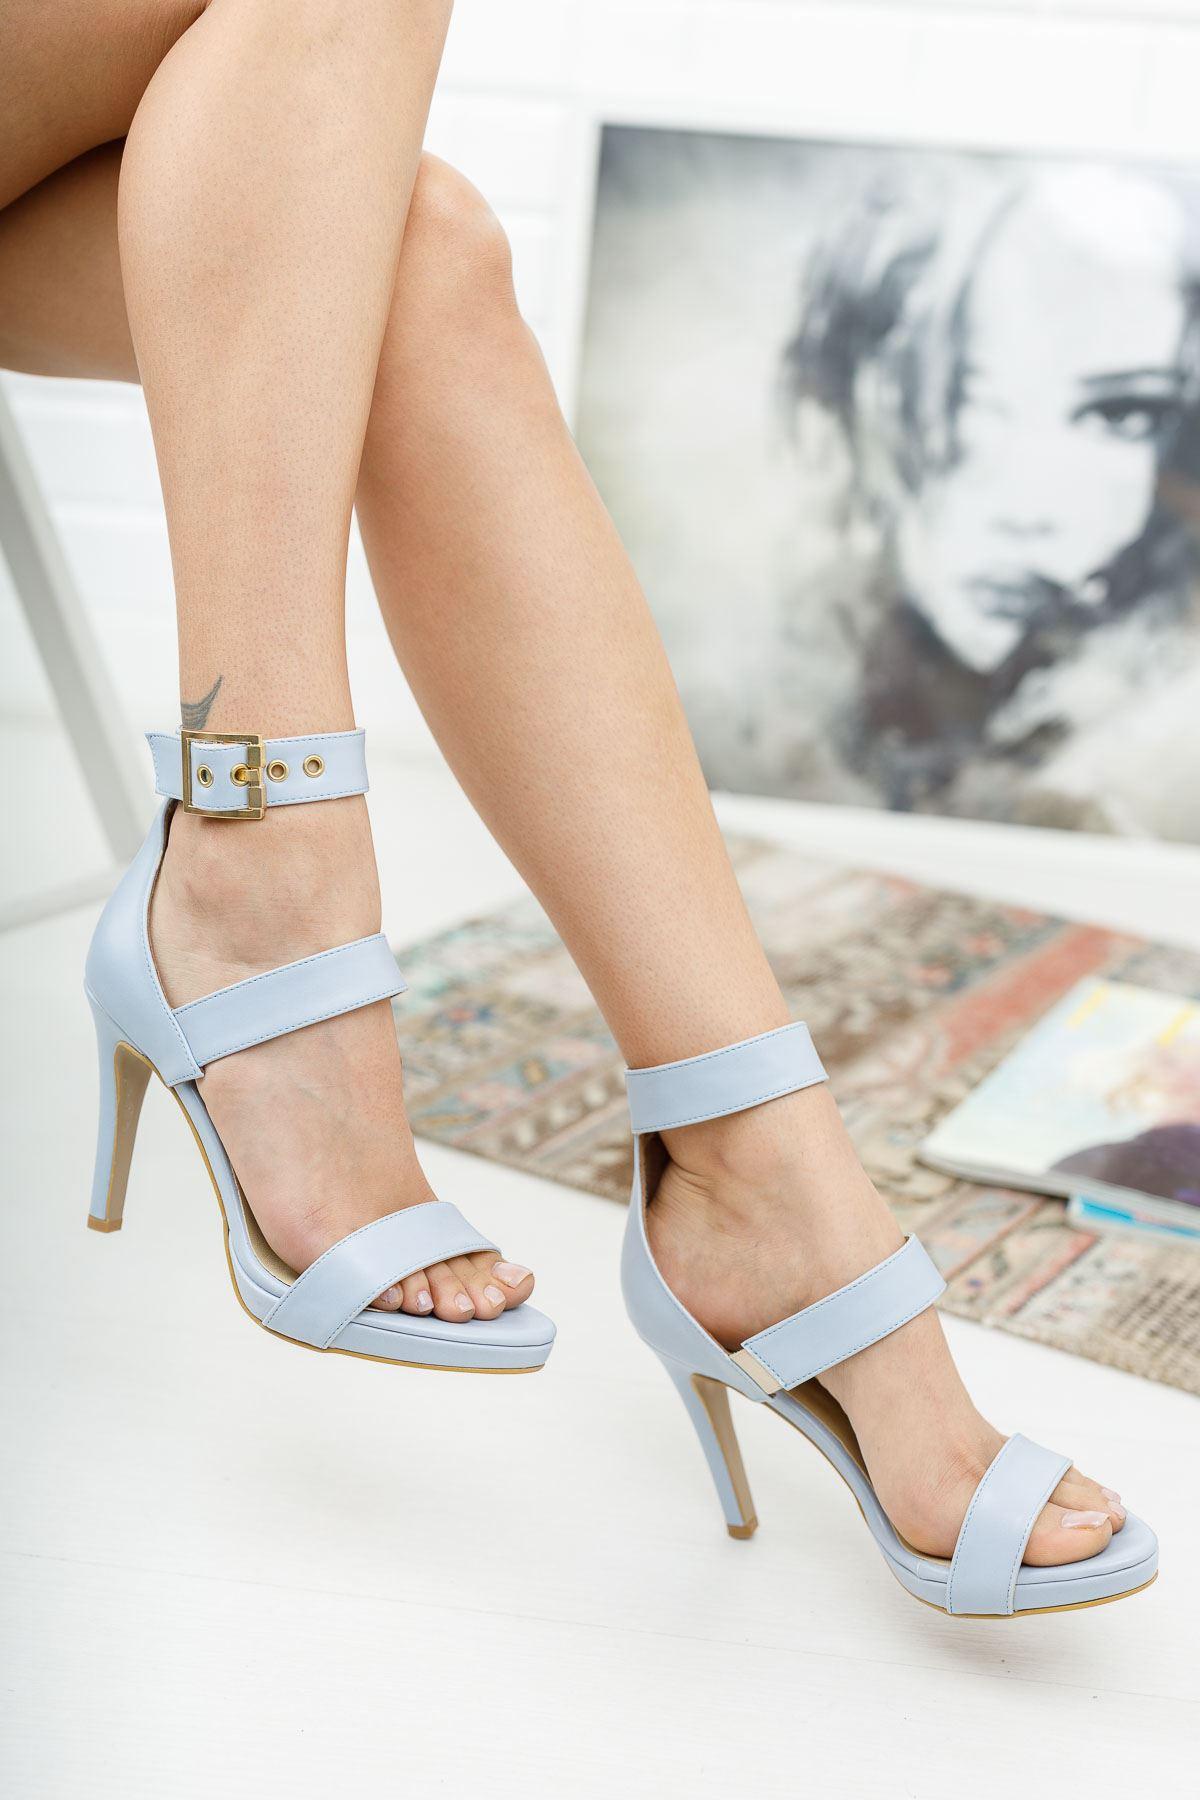 Giorgia Bebe Mavi Cilt Topuklu Ayakkabı